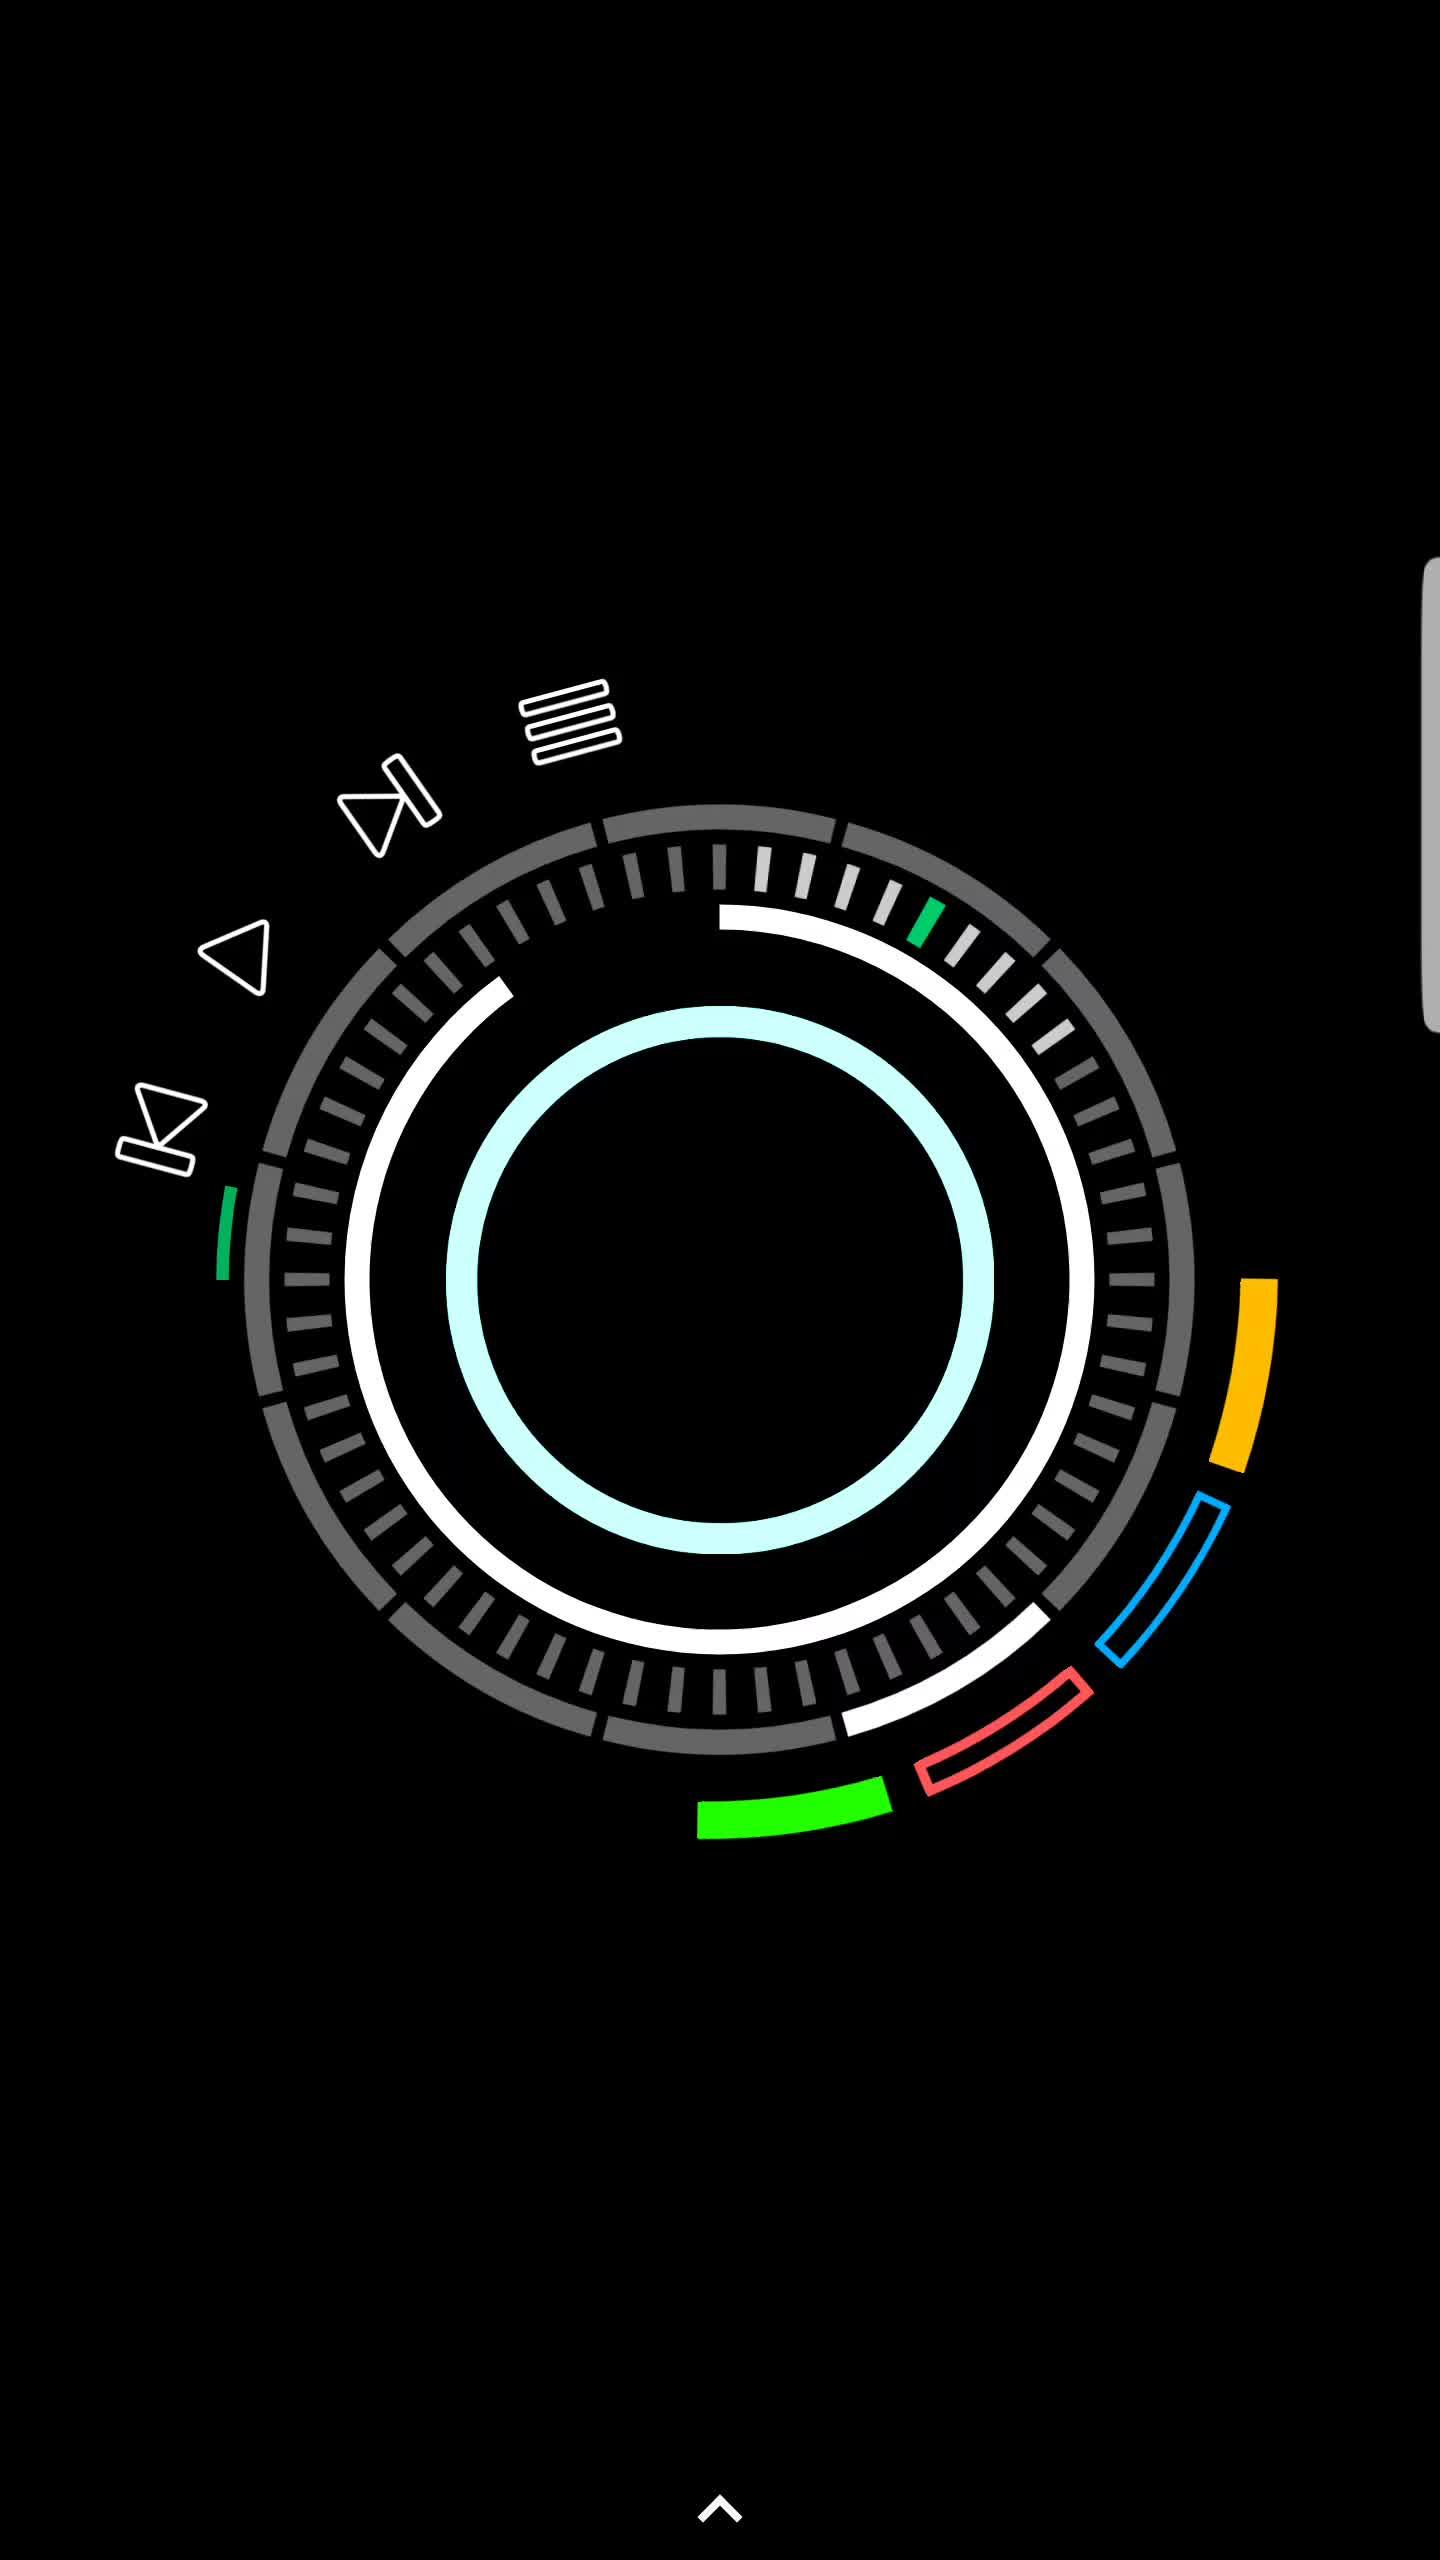 androidthemes, klwp, kustom, Core Beat GIFs